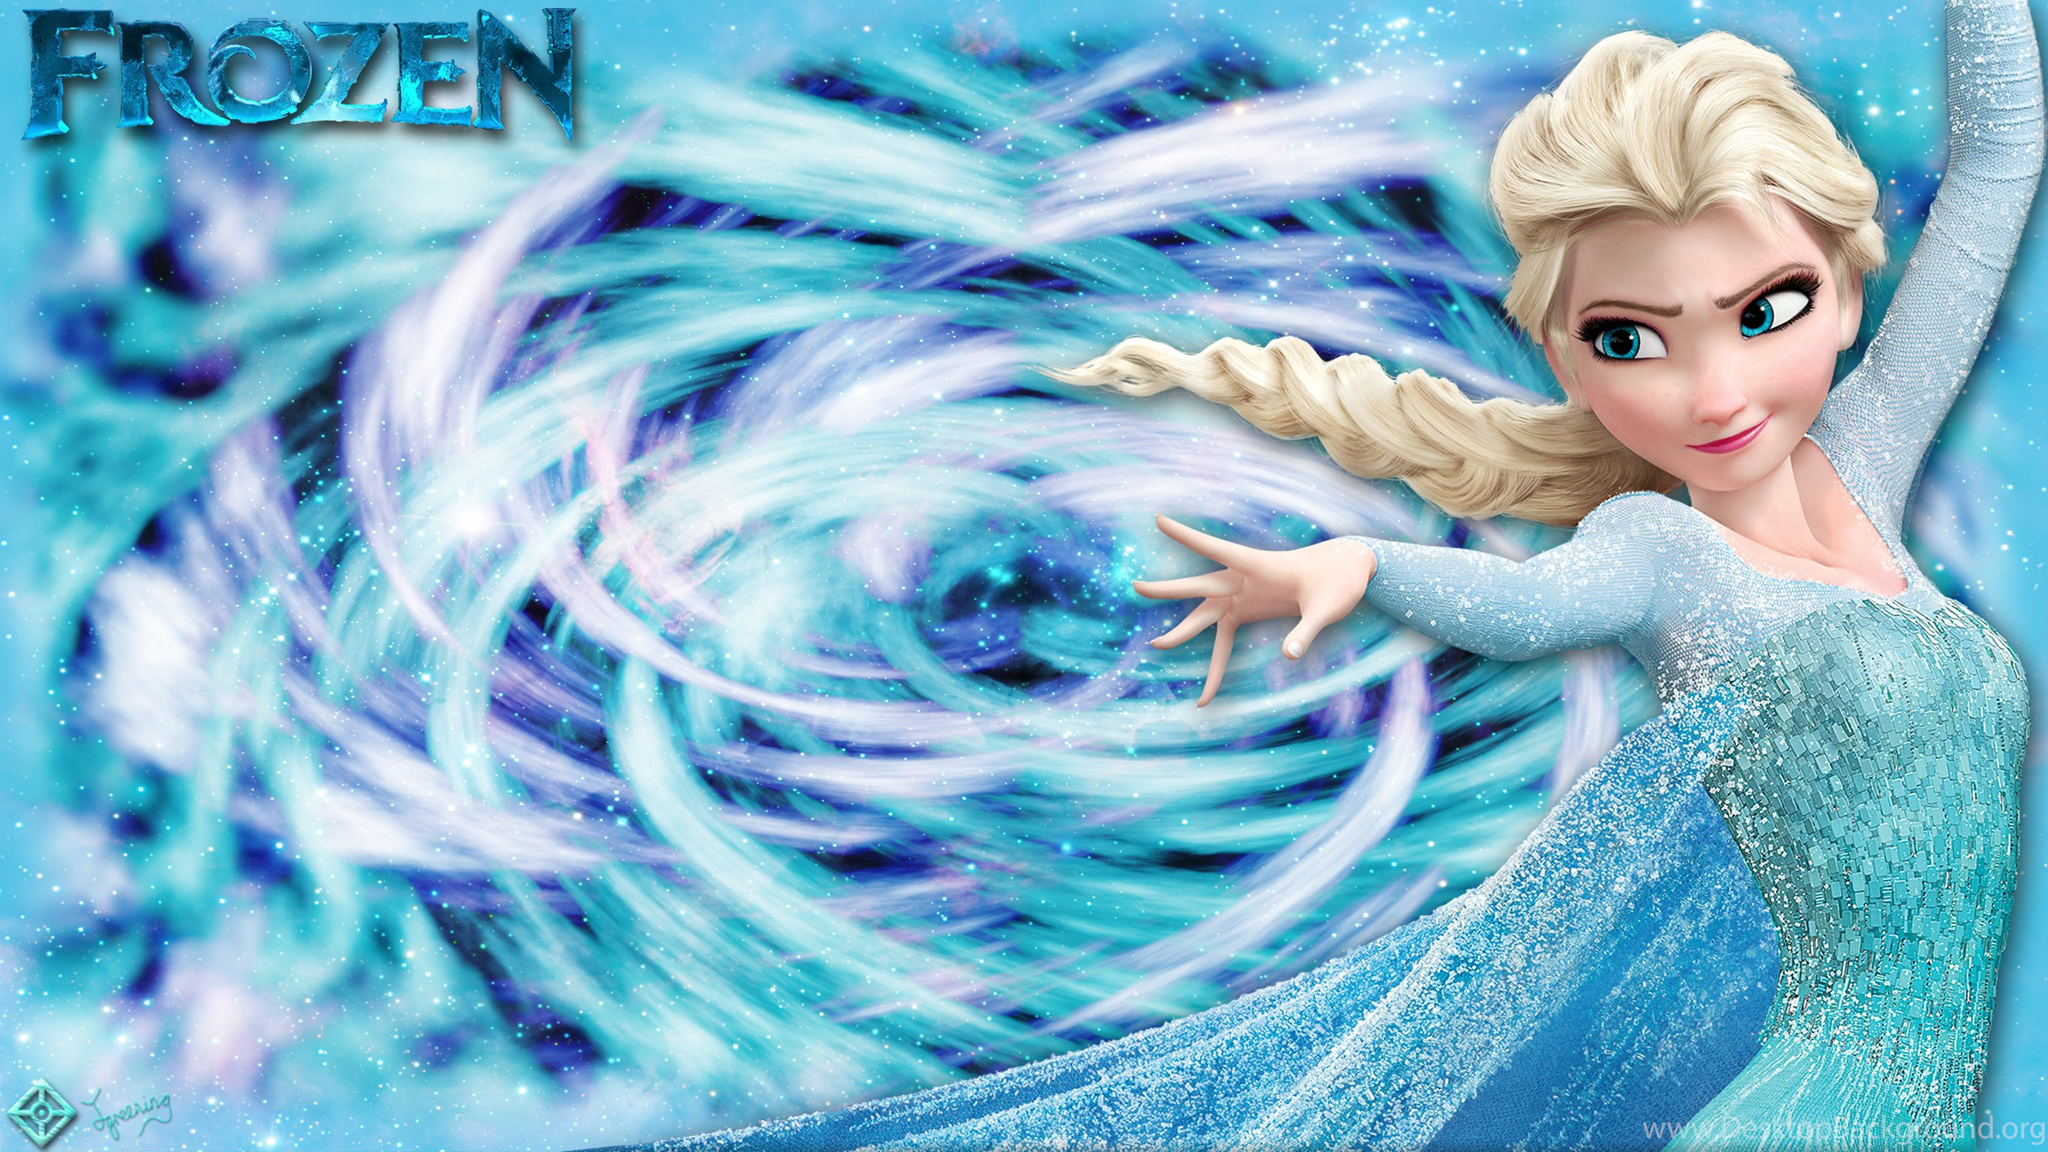 297 Frozen Hd Wallpapers Desktop Background